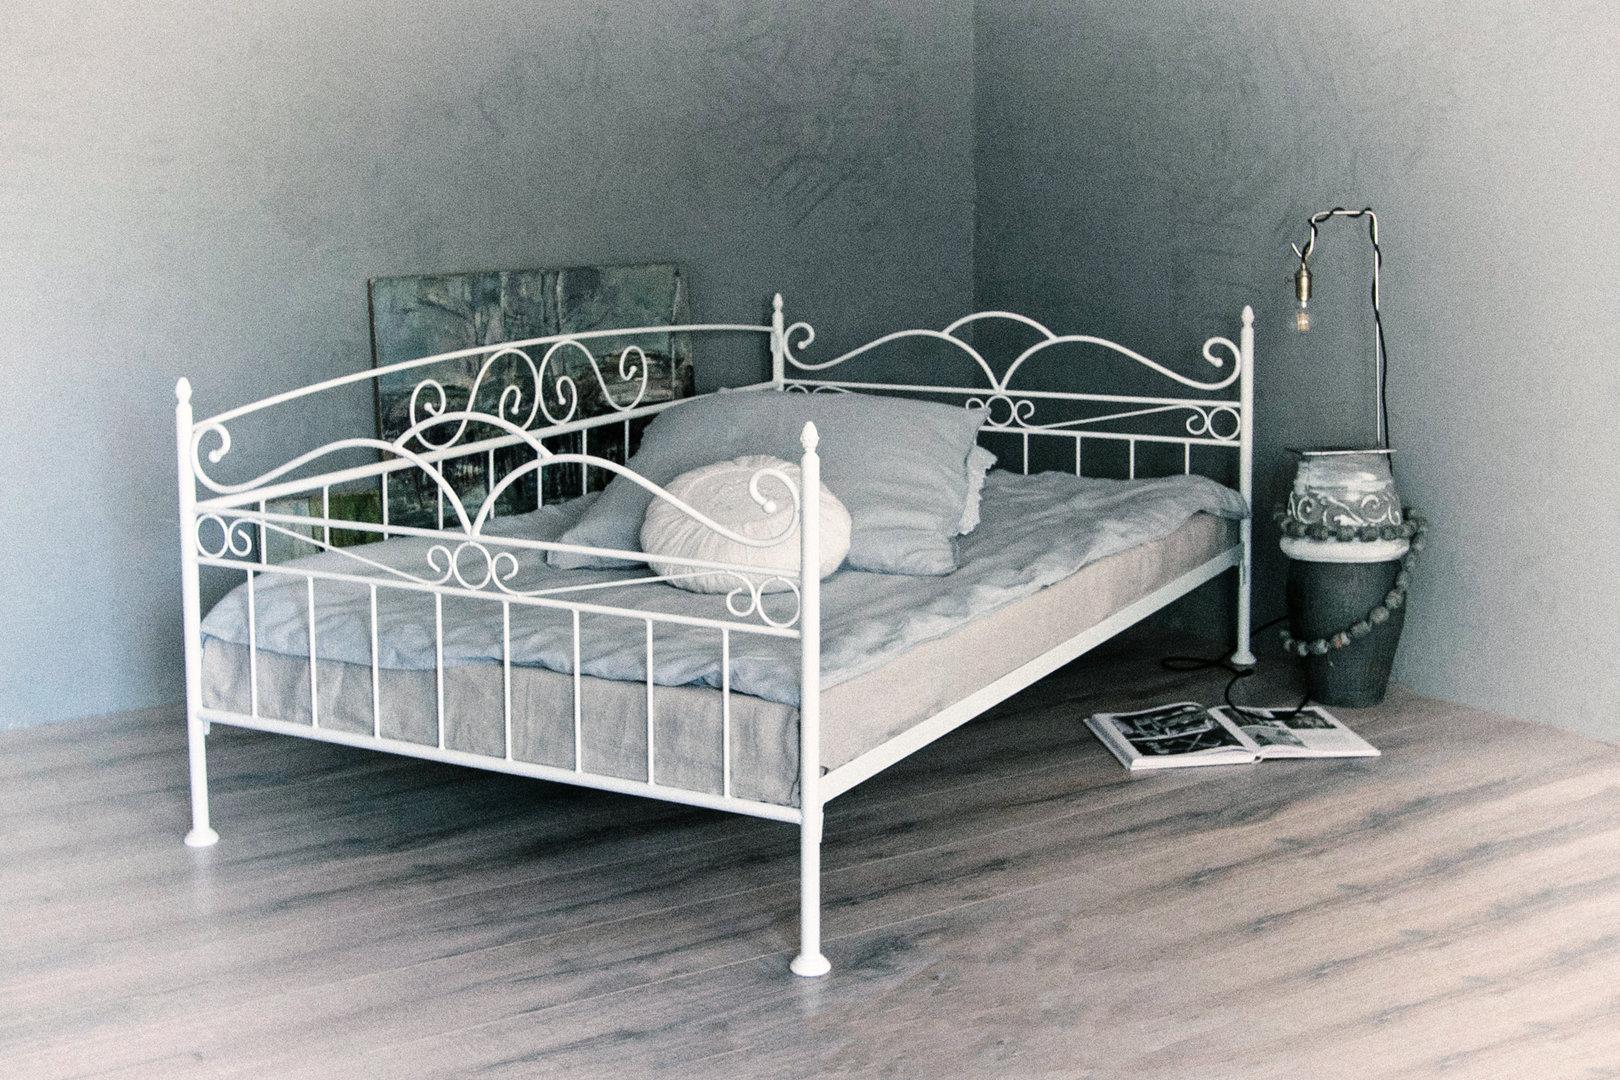 Full Size of 140x200 Bett Trend Sofa In Weiss Ecru Transparent Kupfer Stabiles Betten Weiß Eiche Sonoma 180x200 Komplett Mit Lattenrost Und Matratze Treca Tojo V Hamburg Bett 140x200 Bett